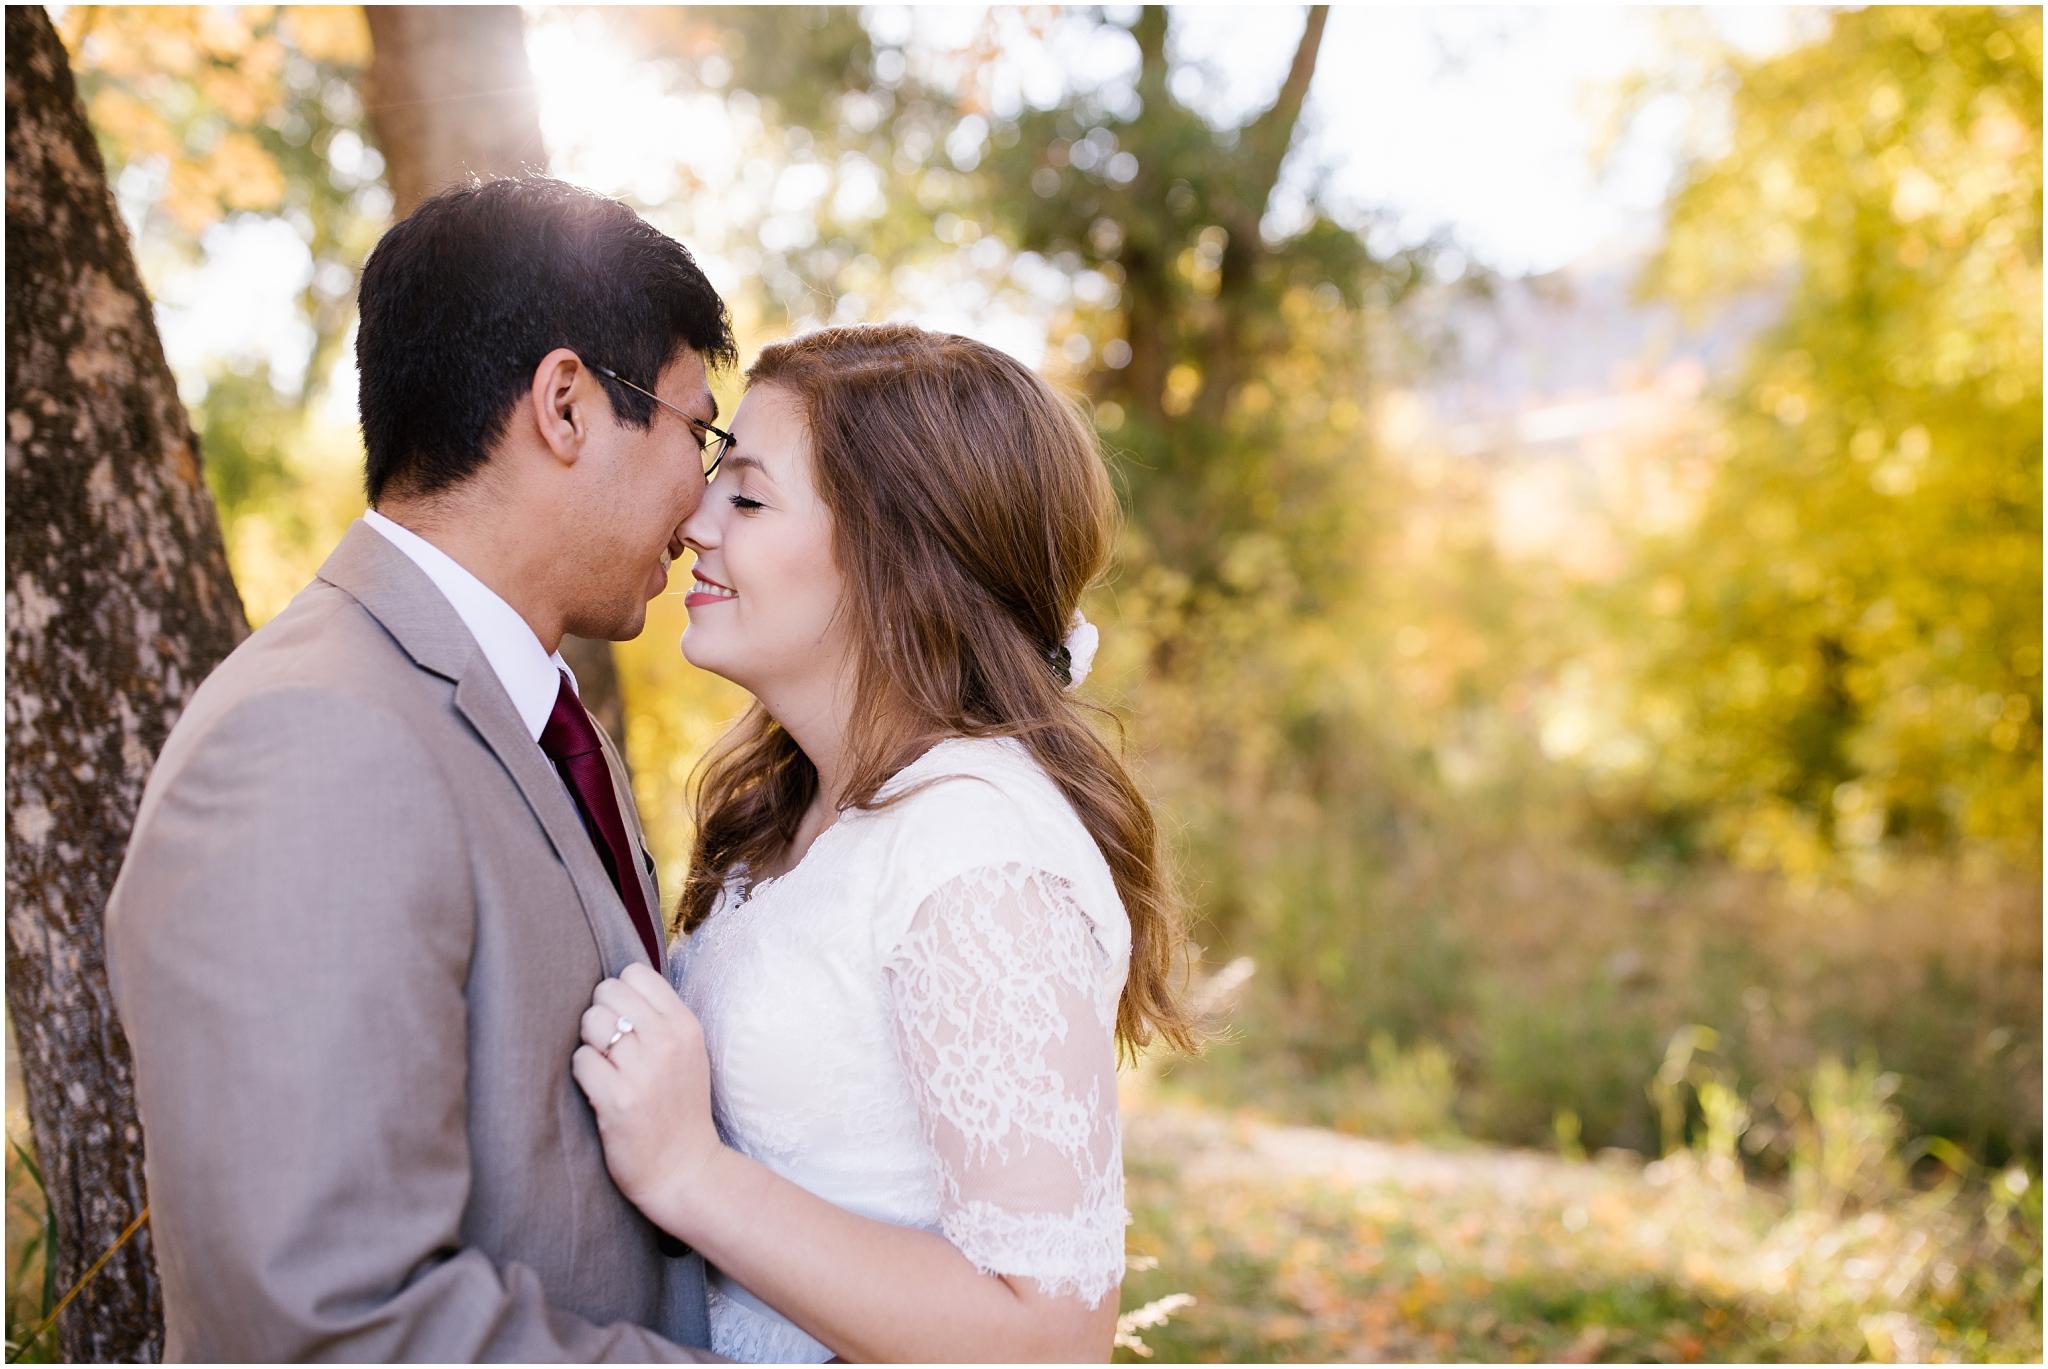 HE-BRIDALS-6_Lizzie-B-Imagery-Utah-Wedding-Photographer-Central-Utah-Park-City-Salt-Lake-City-Hobble-Creek-Canyon-Springville.jpg